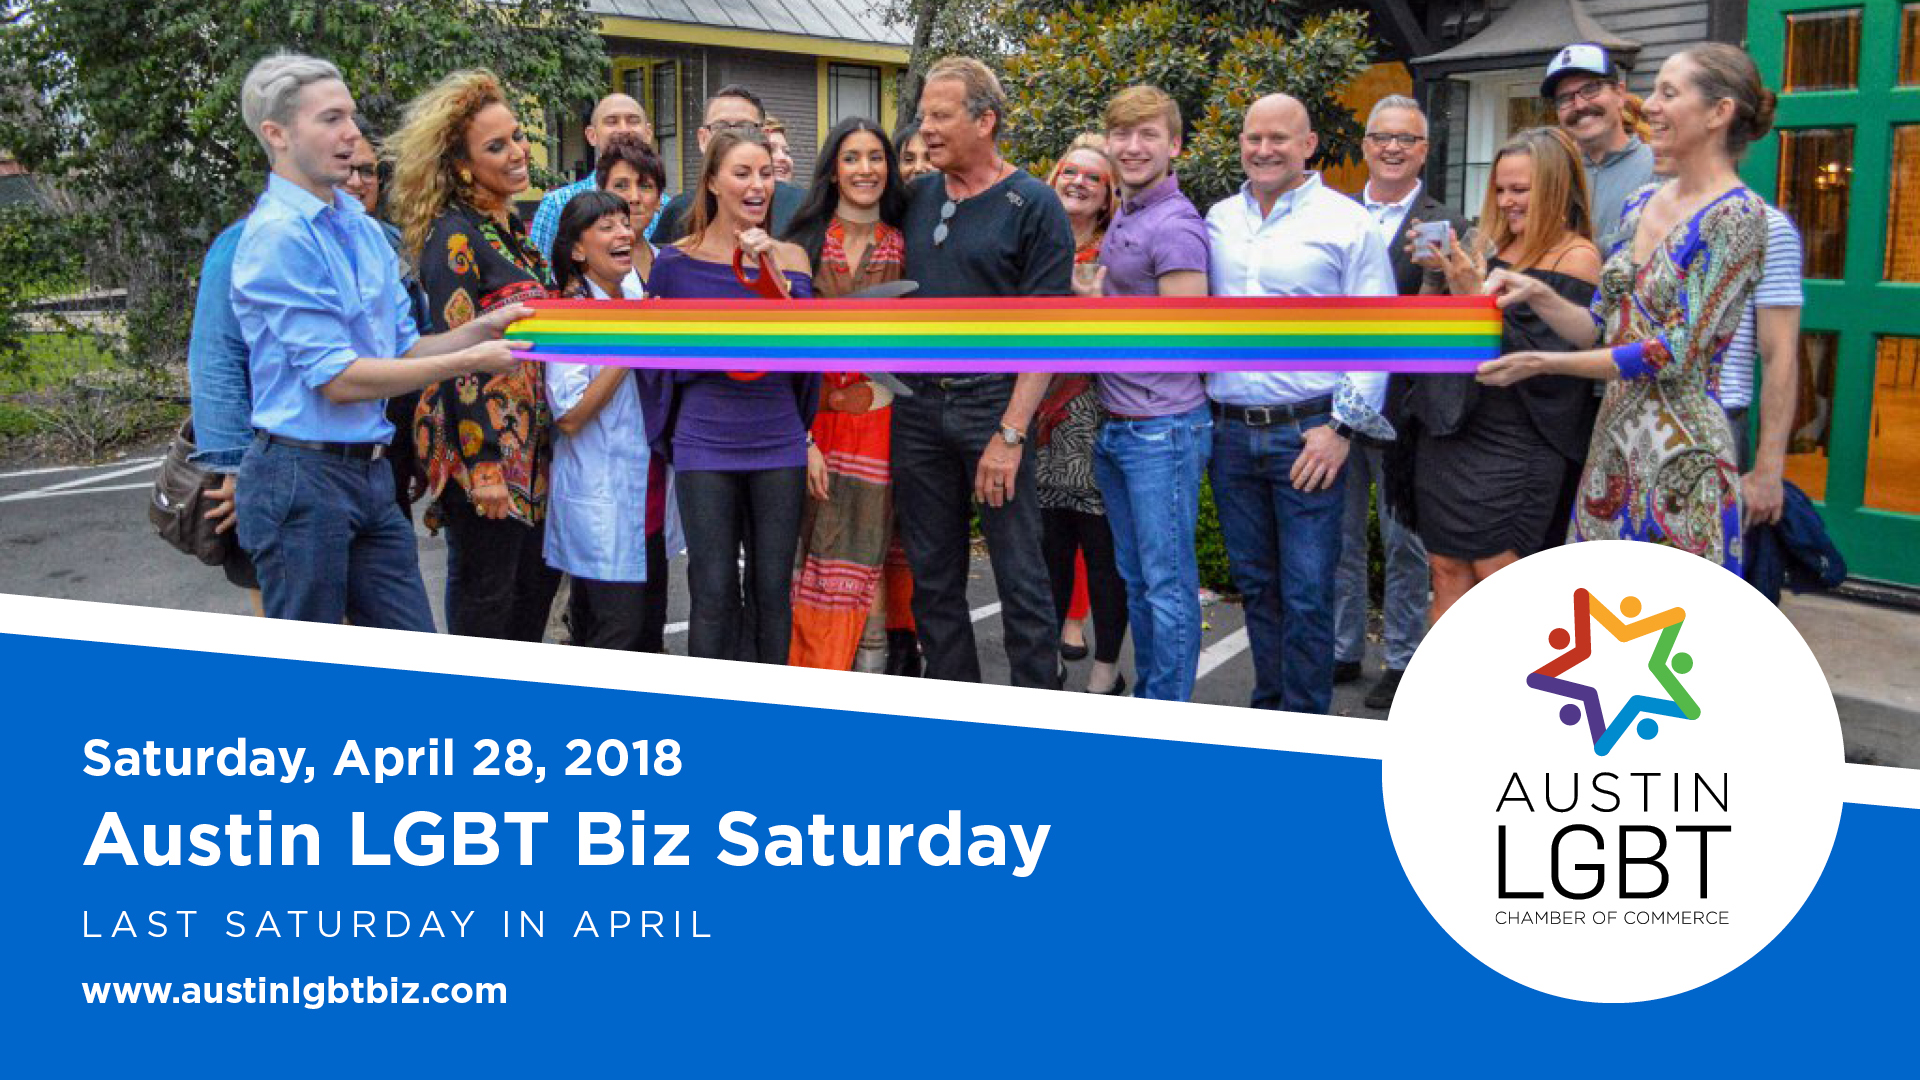 AGLBTCC_LGBTbiz-FBevent.jpg